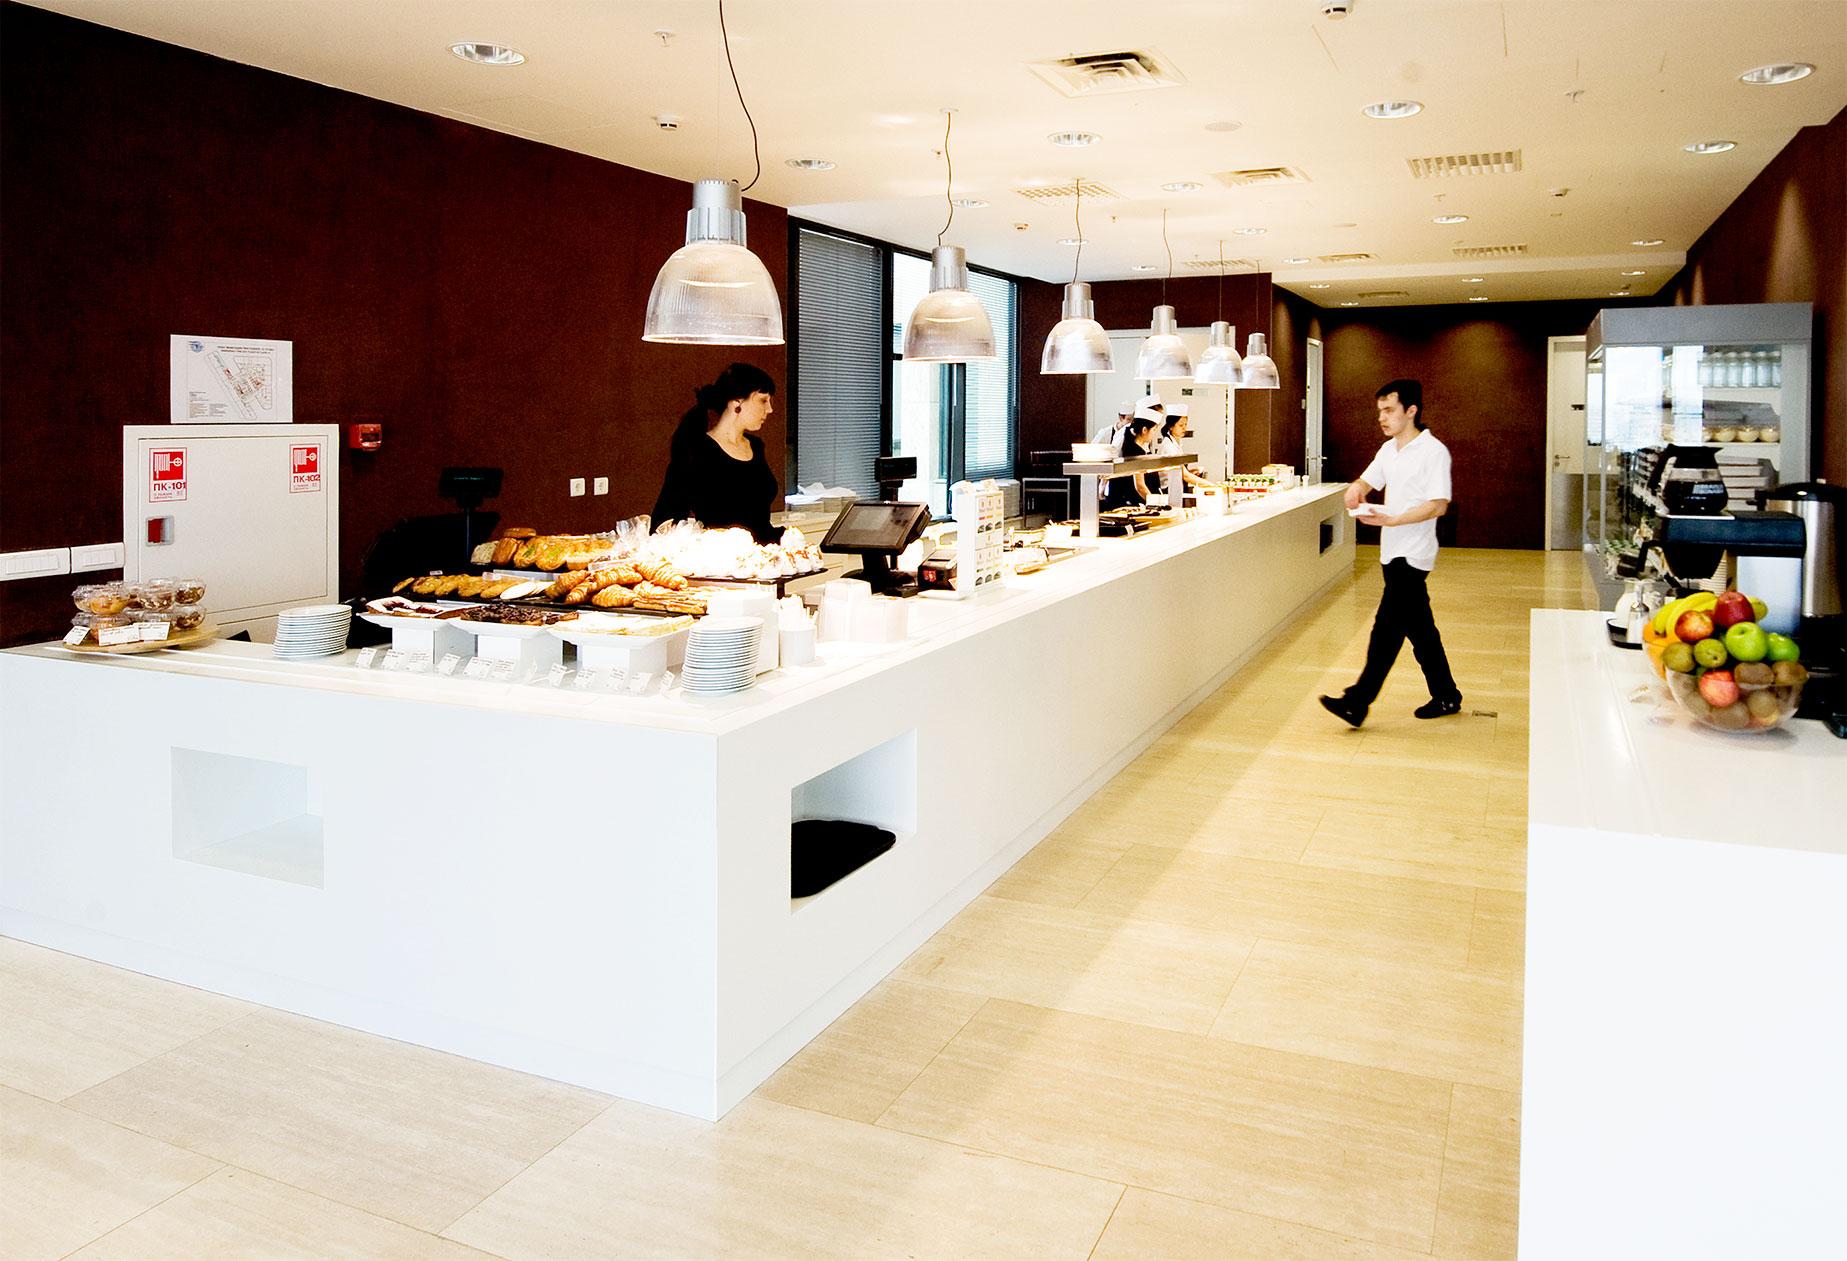 PWC-catering-area-pwc-10th-flr